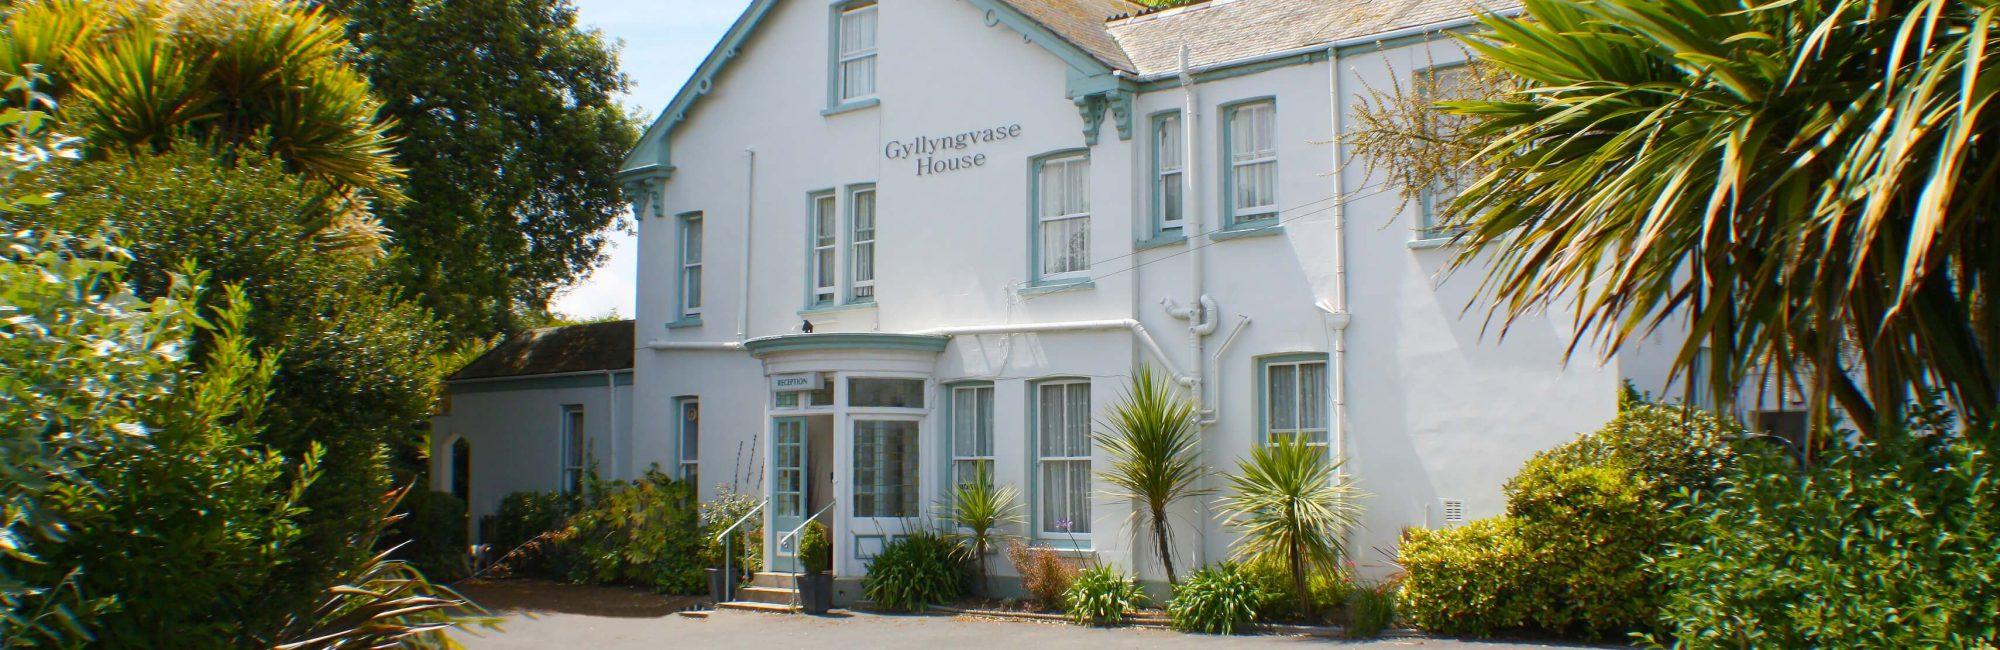 Gyllyngvase House Front